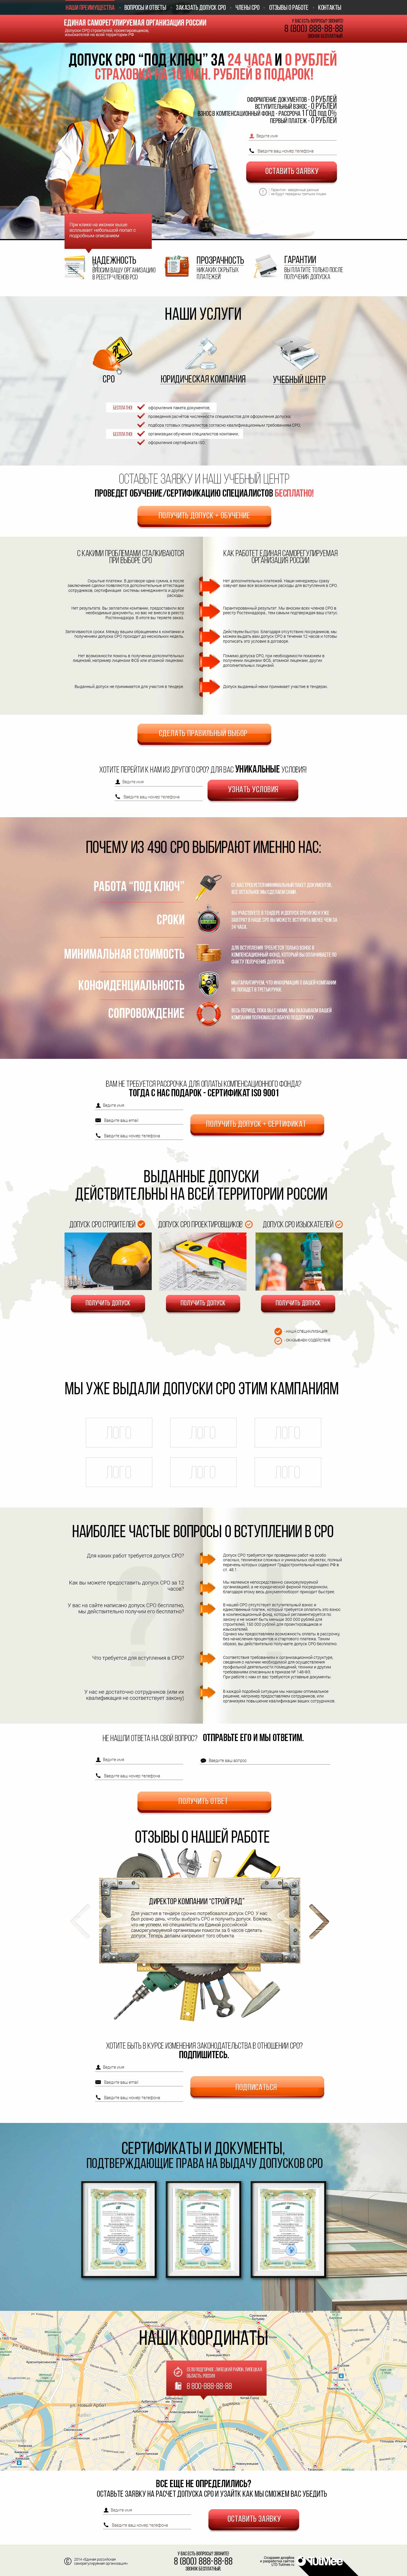 landing page ДОПУСК СРО